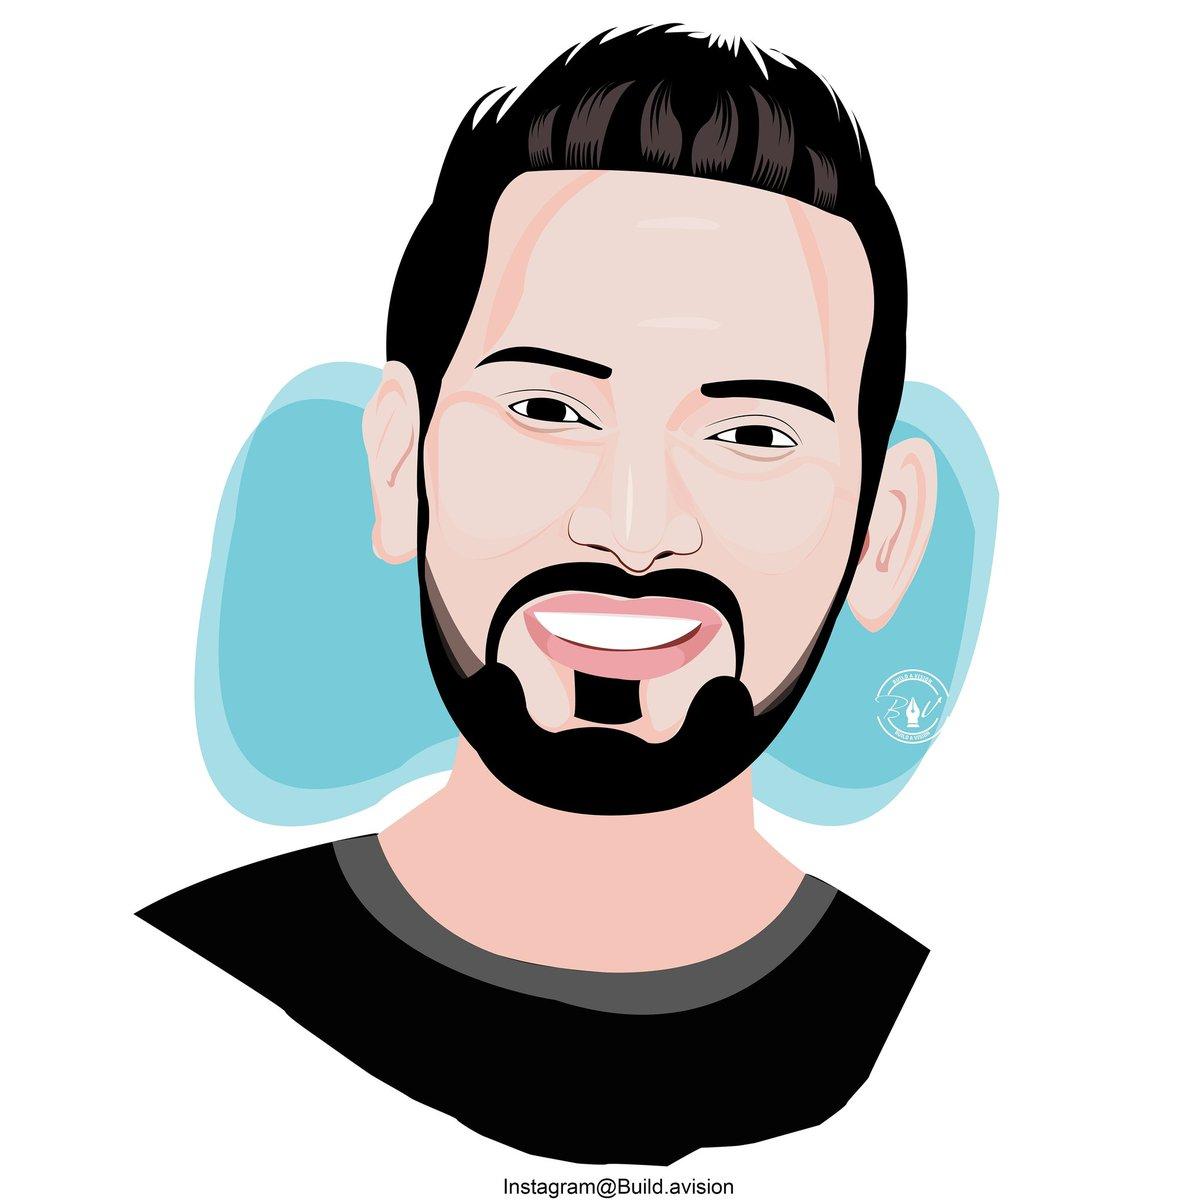 @iamgarrysandhu  Paji ji choti jehi koshish mere vlo  Waheguru tuhanu chardikala ch rakhe veer ji  Instagram @buildavision #ghaint #munda #shooting #jatta #official_dhillon_preeet #sukhemuzicaldoctorz #pollywood #punjabicelebrity #teampollywood #chachachatrapic.twitter.com/zNwdFWgSeX